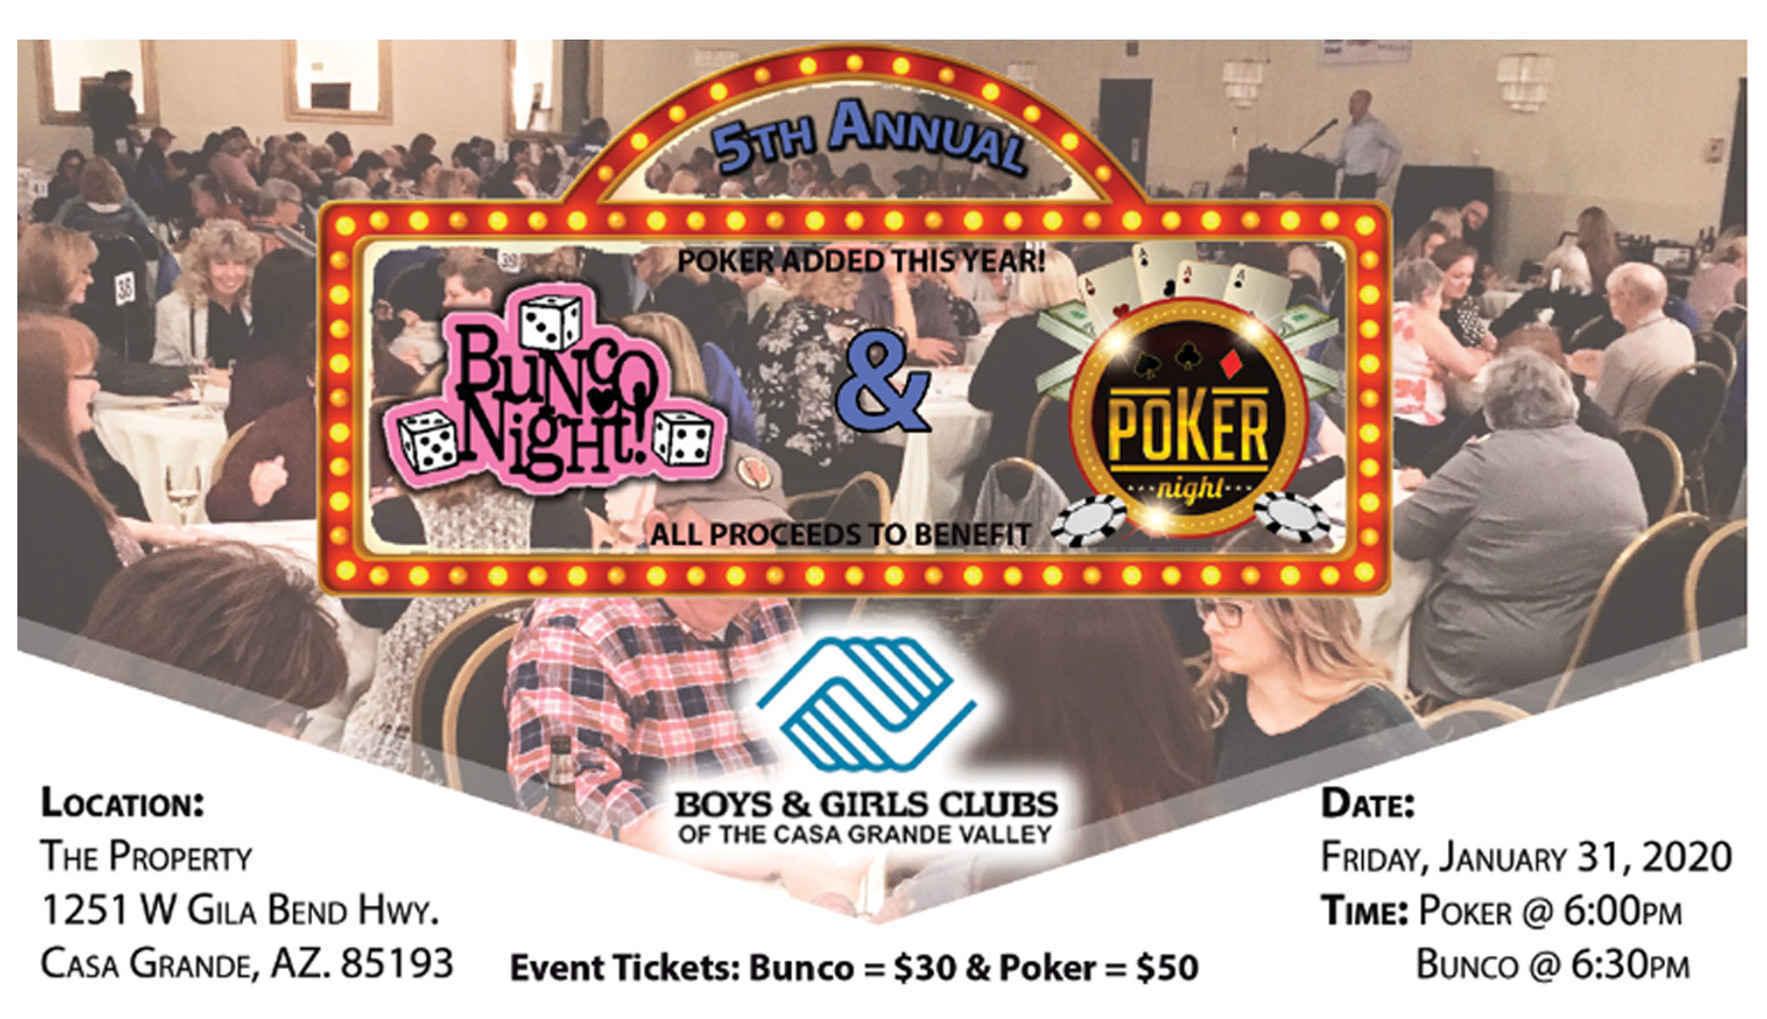 Bunco & Poker Night image